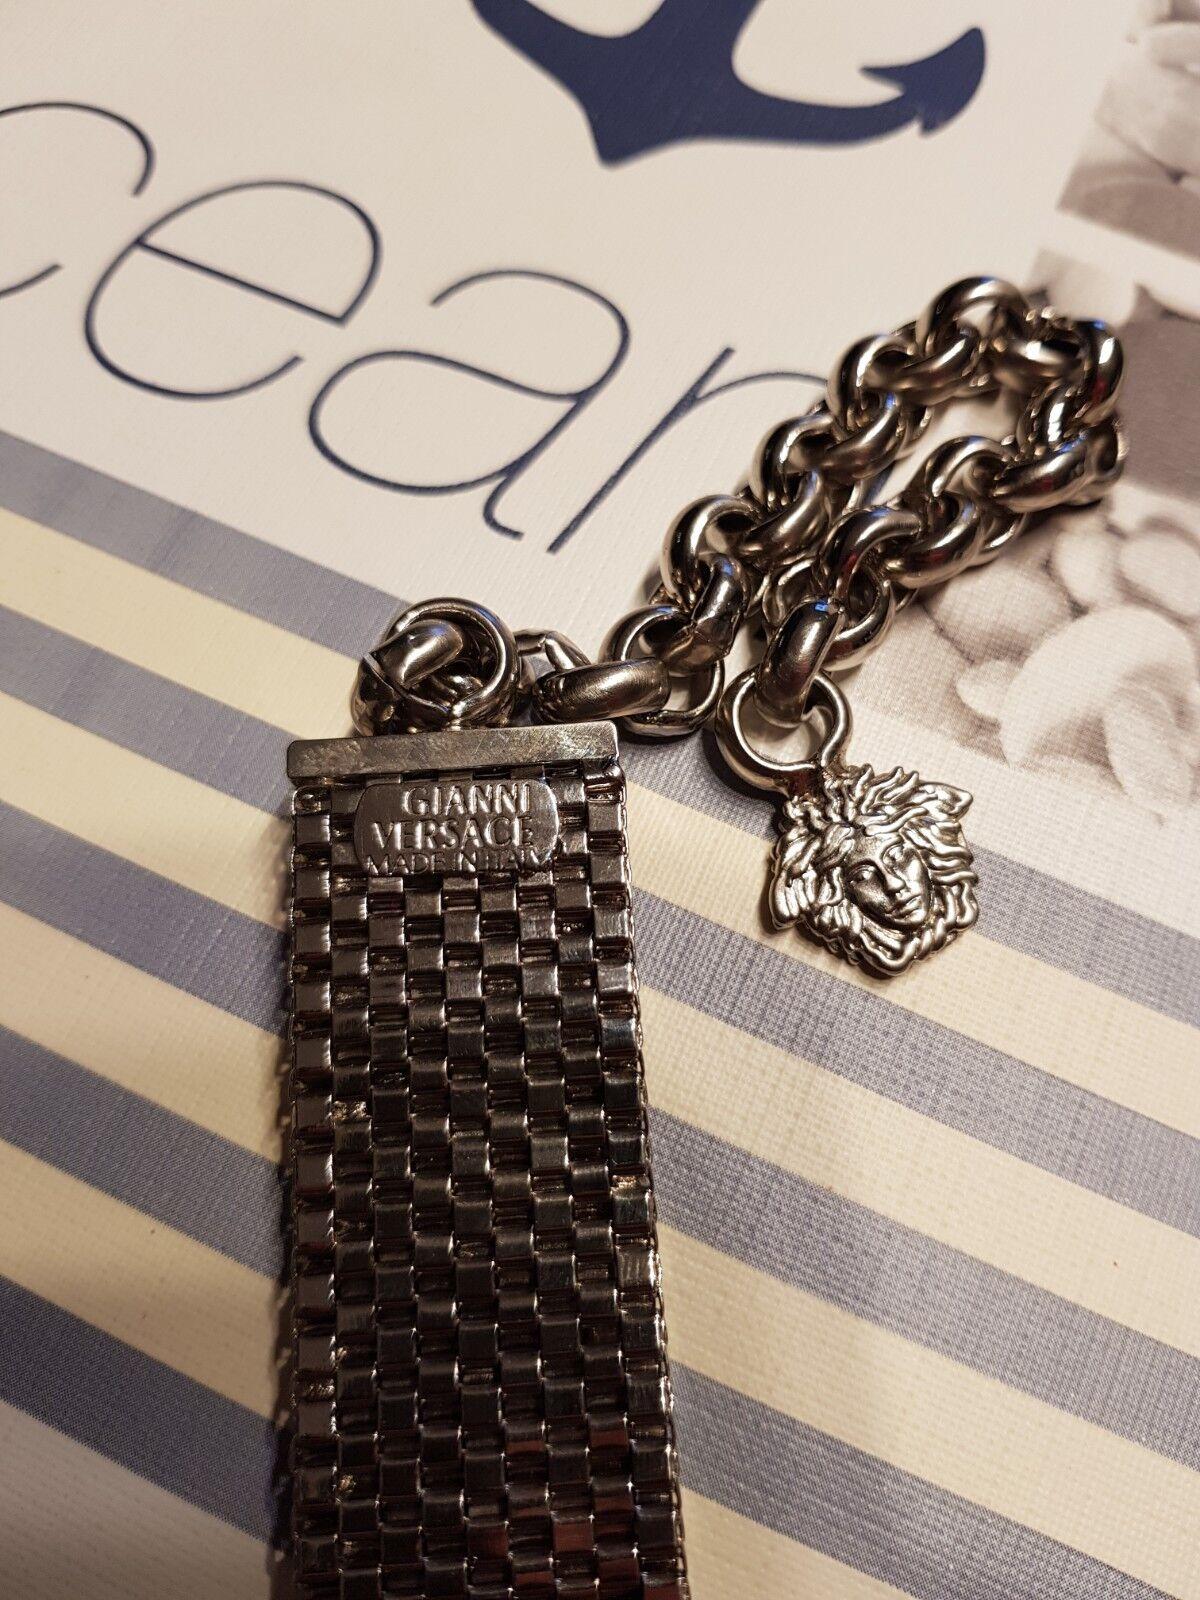 Gianni Versace Damengürtel Damengürtel Damengürtel | Verschiedene Stile  | Großer Verkauf  | Diversified In Packaging  7f1fde